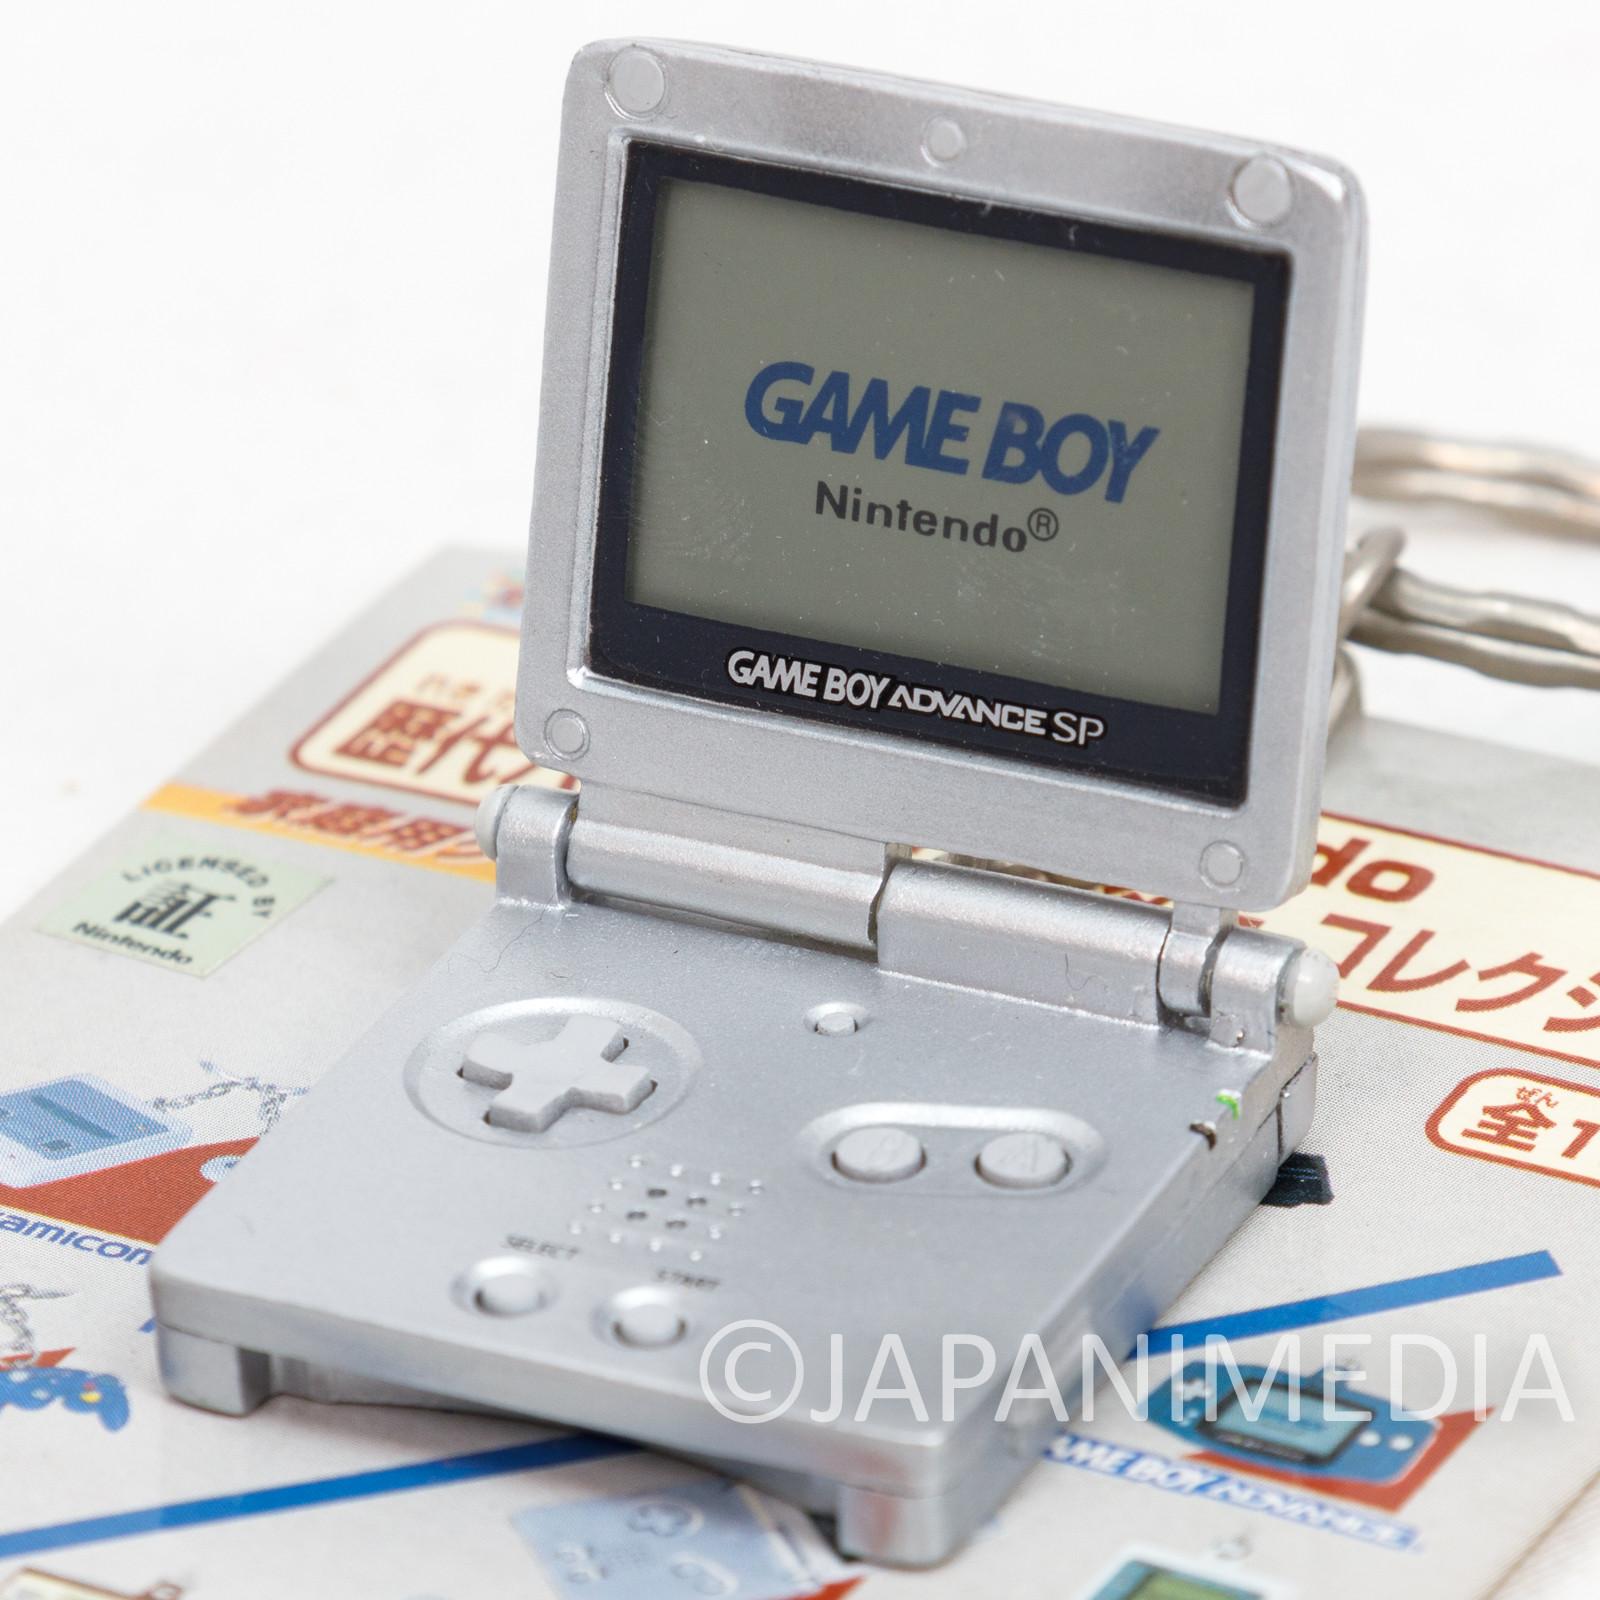 Nintendo Handy Game History Miniature Figure Key Chain GAME BOY Advance SP